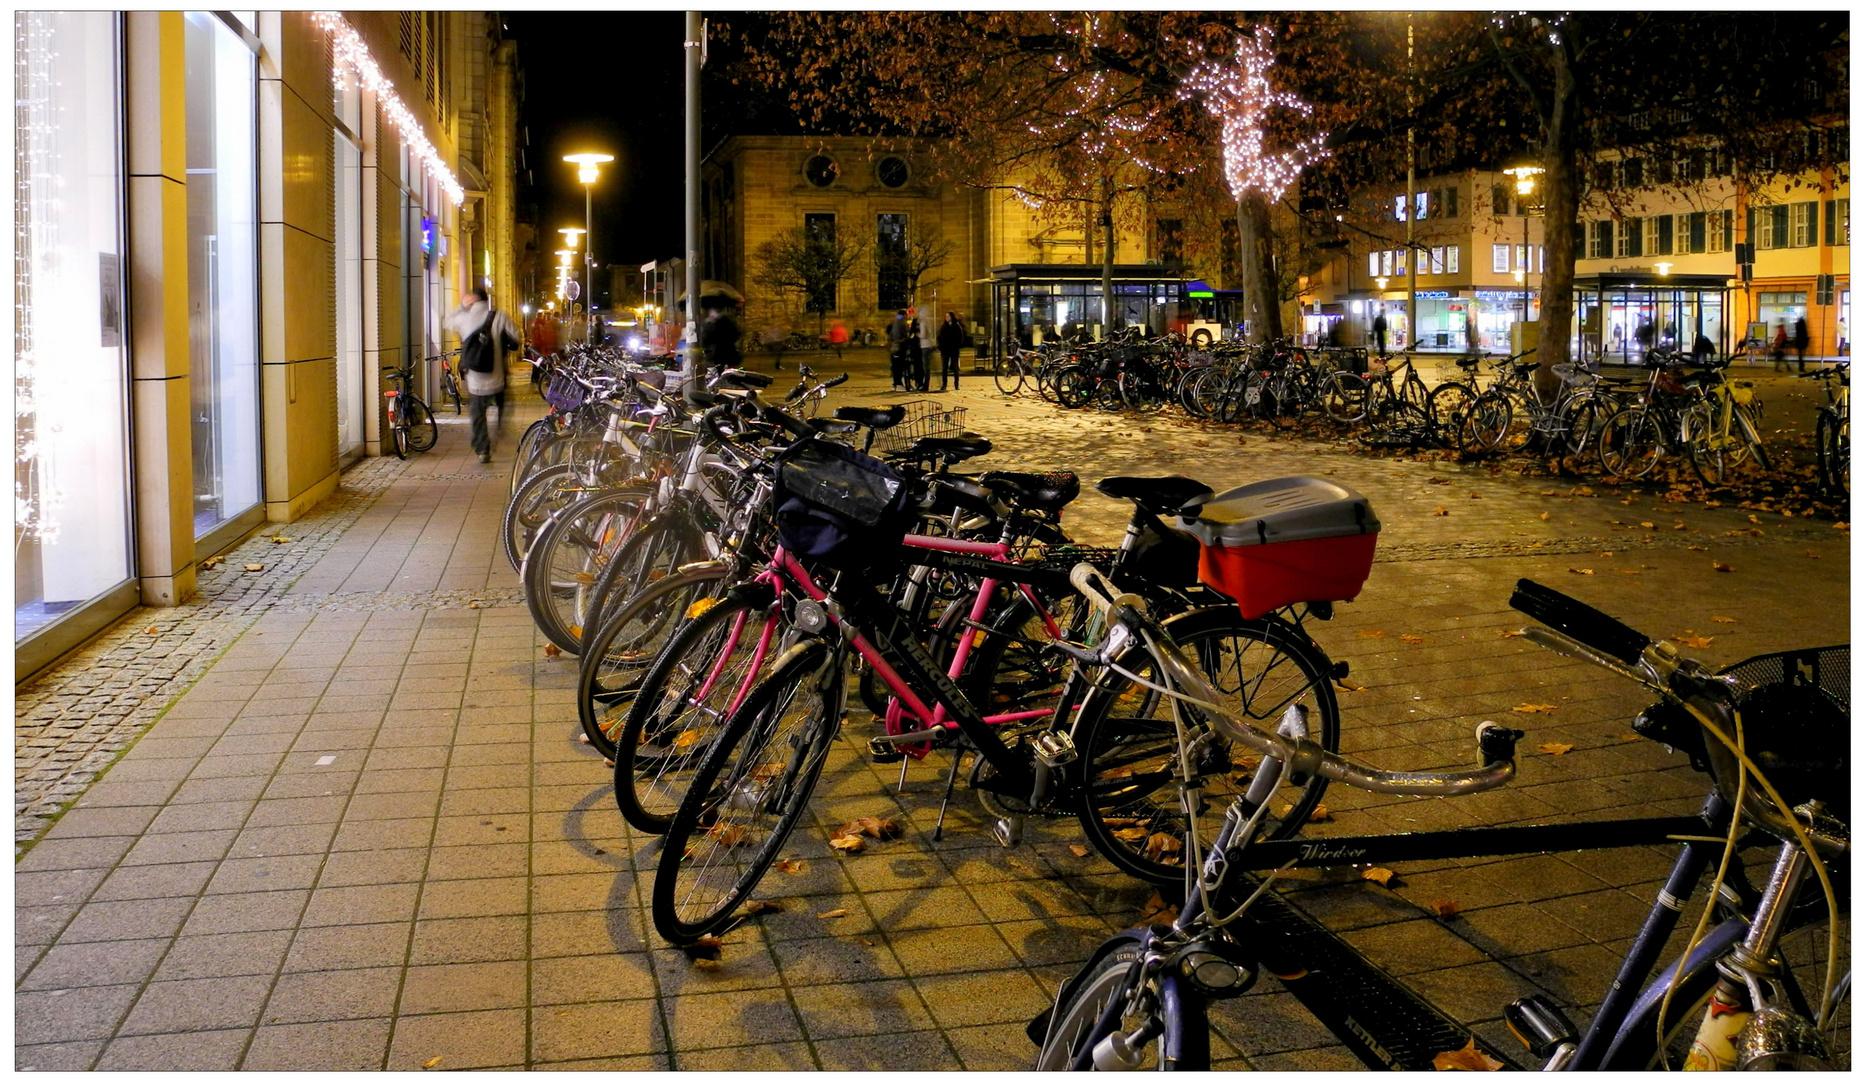 Erlangen 2011, bicicletas en la plaza de los Hugenotten (Fahrräder auf dem Hugenottenplatz)